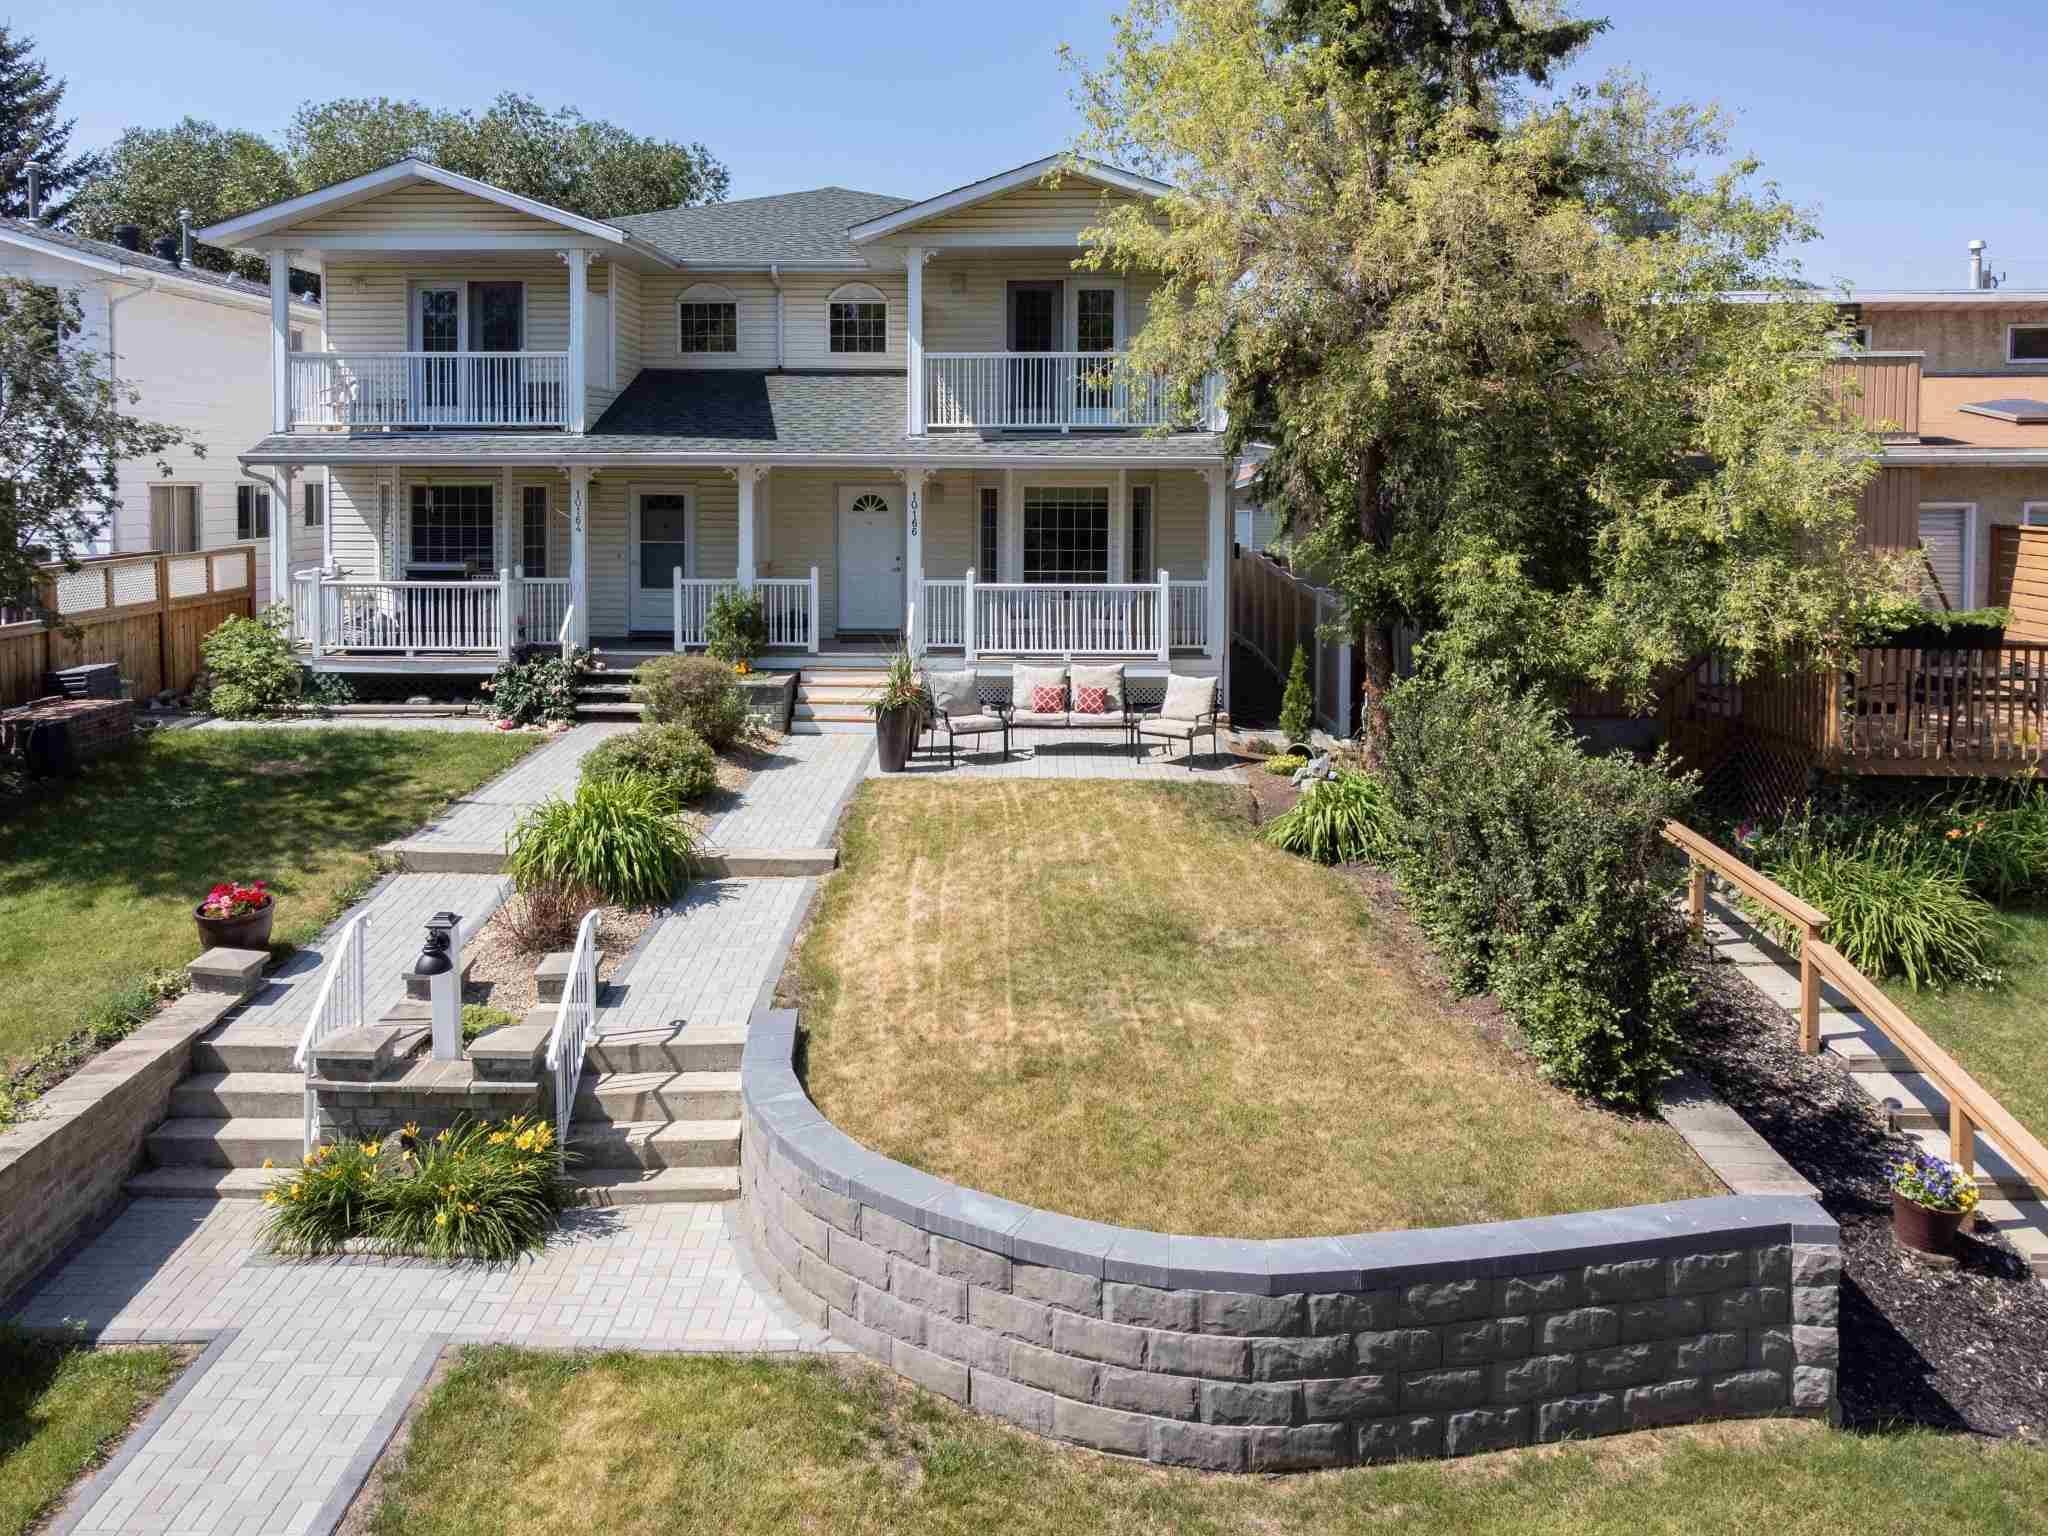 Main Photo: 10166 87 Street in Edmonton: Zone 13 House Half Duplex for sale : MLS®# E4253630